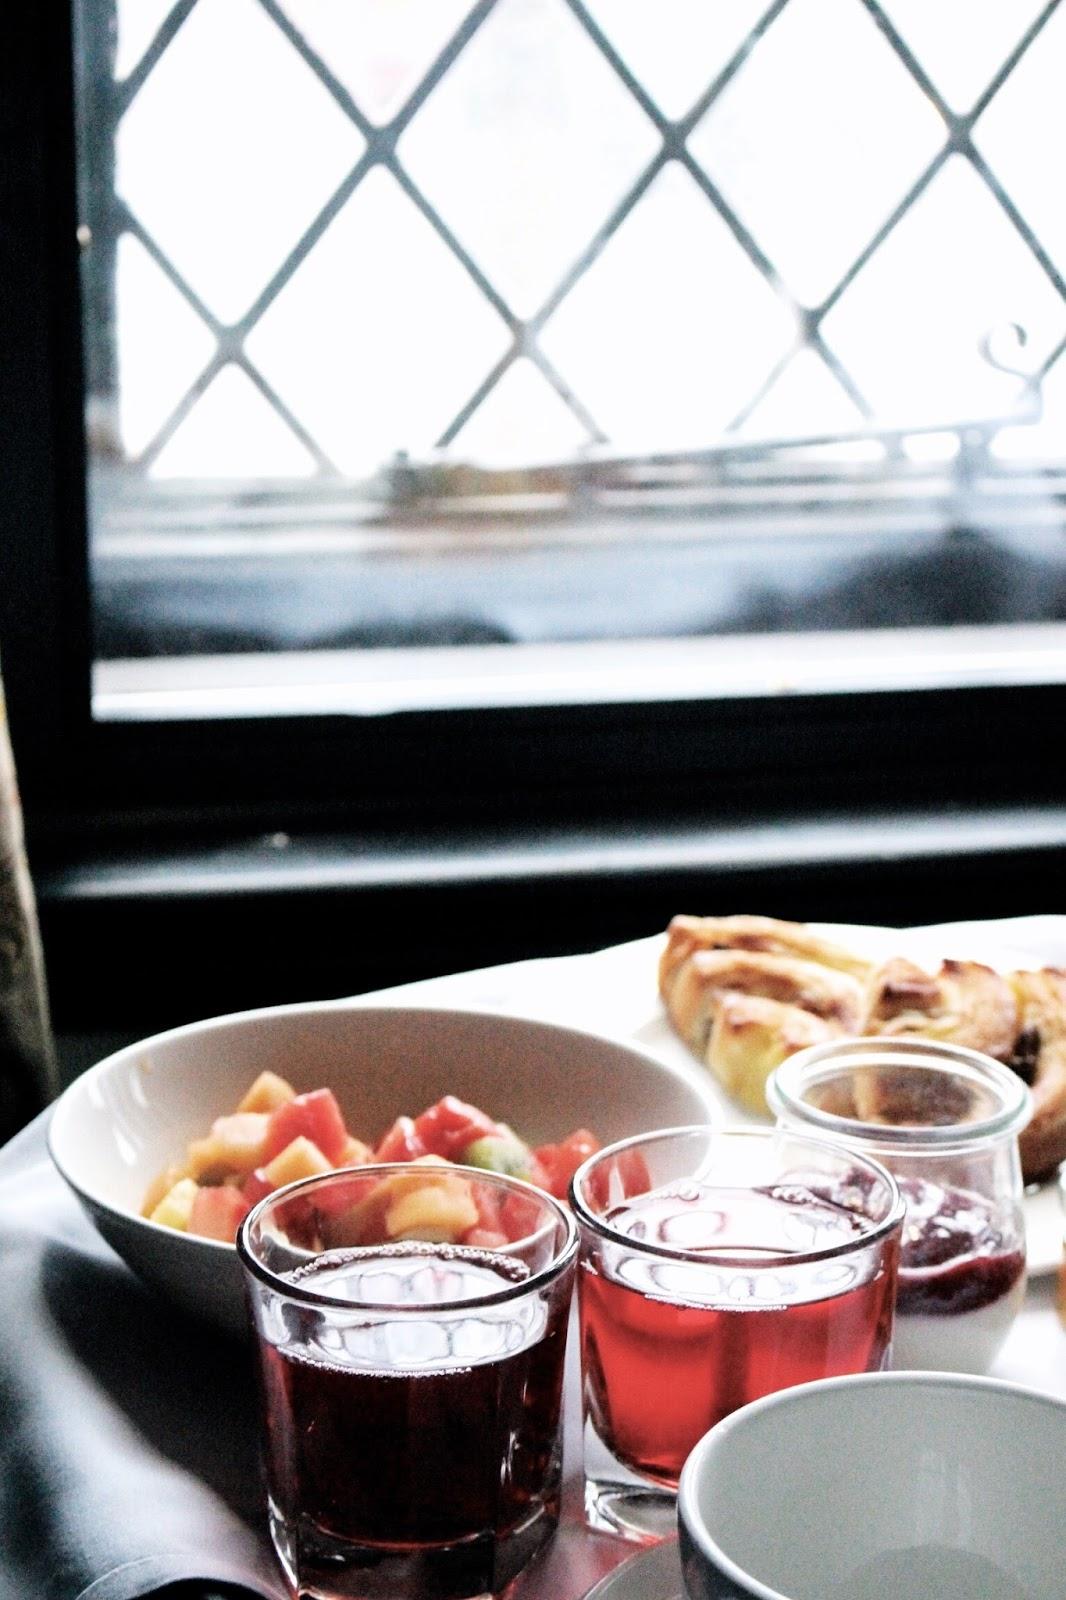 Stratford-upon-Avon room service breakfast